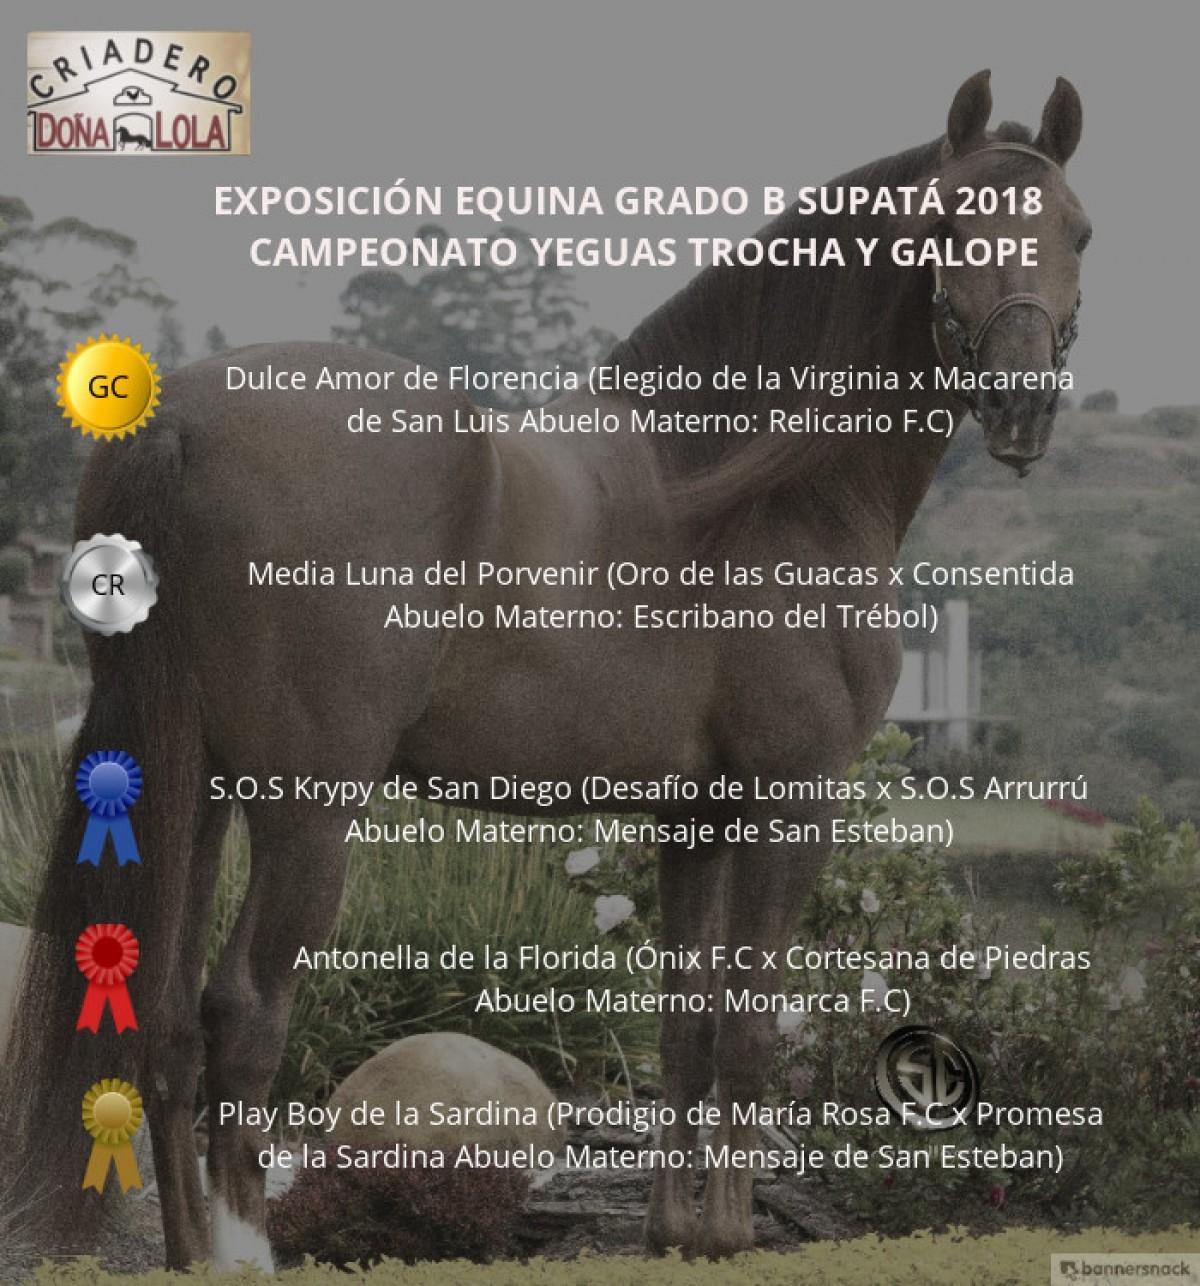 VÍDEO: Dulce Amor Campeona, Media Luna Reservada, Trocha Y Galope, Supatá 2018